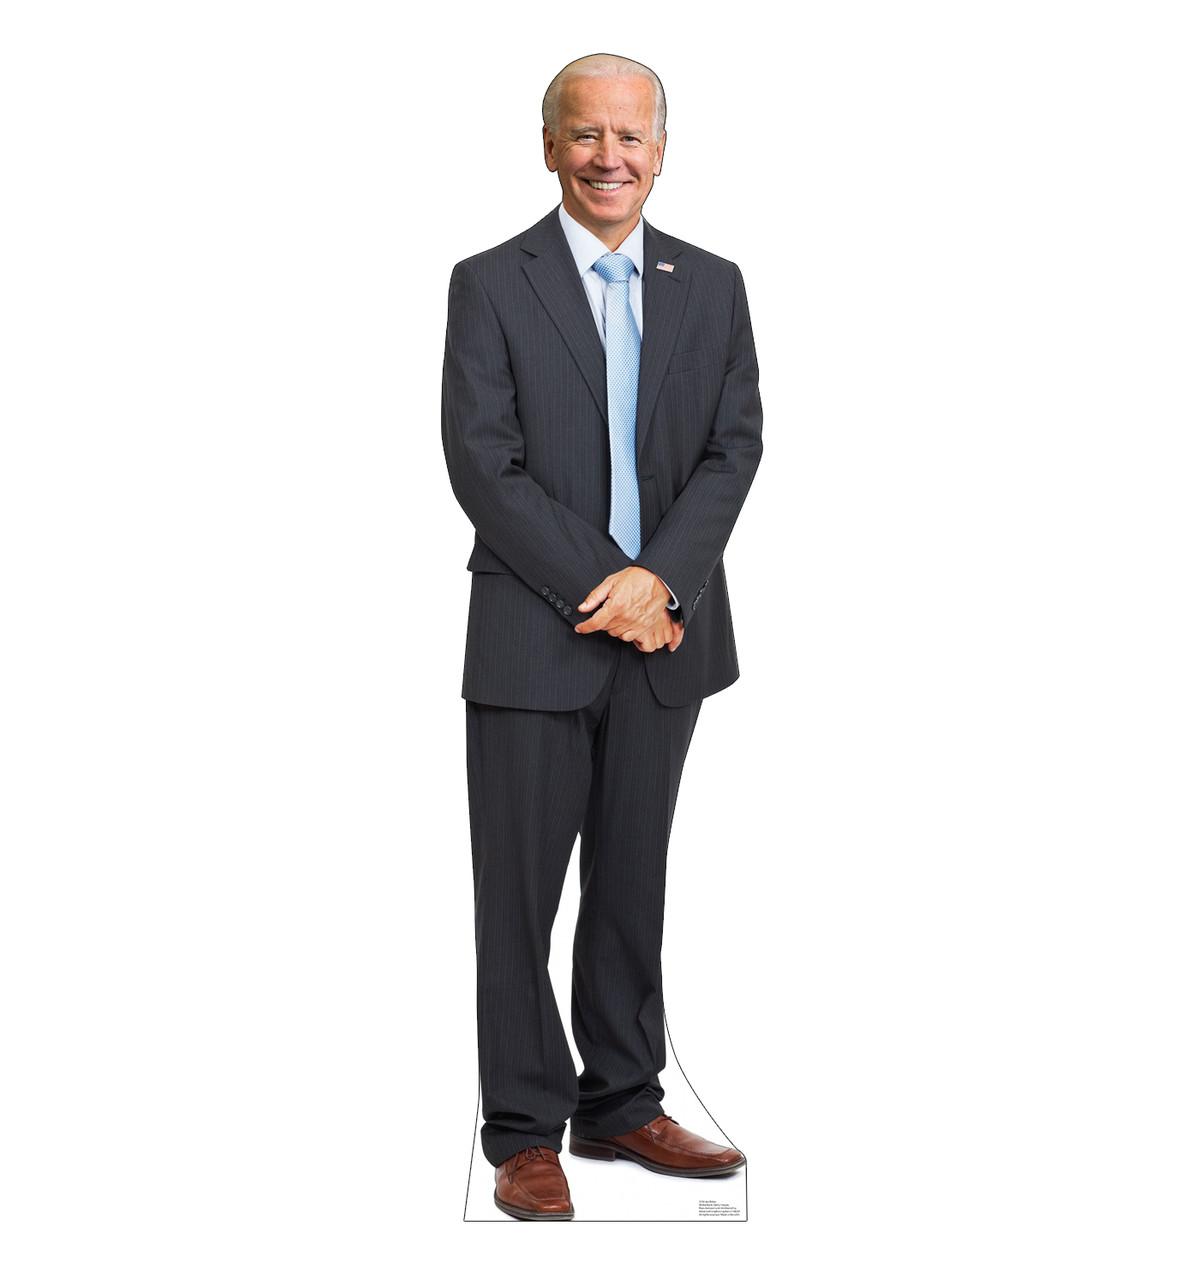 Life-size standee of President Joe Biden.